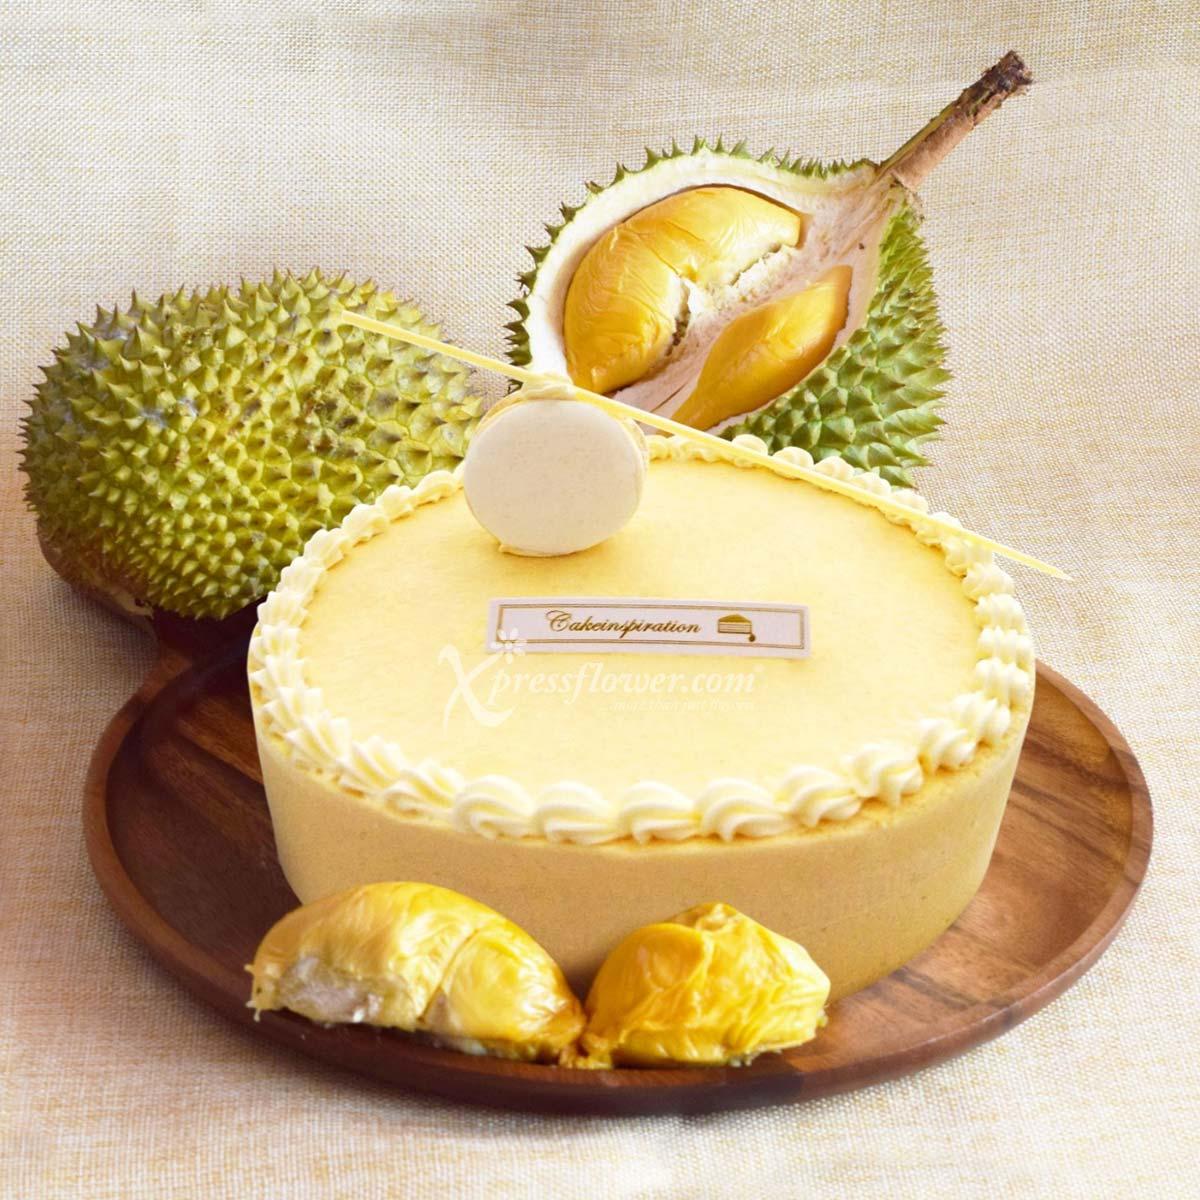 Durian Mousse Cake (Cake Inspiration)